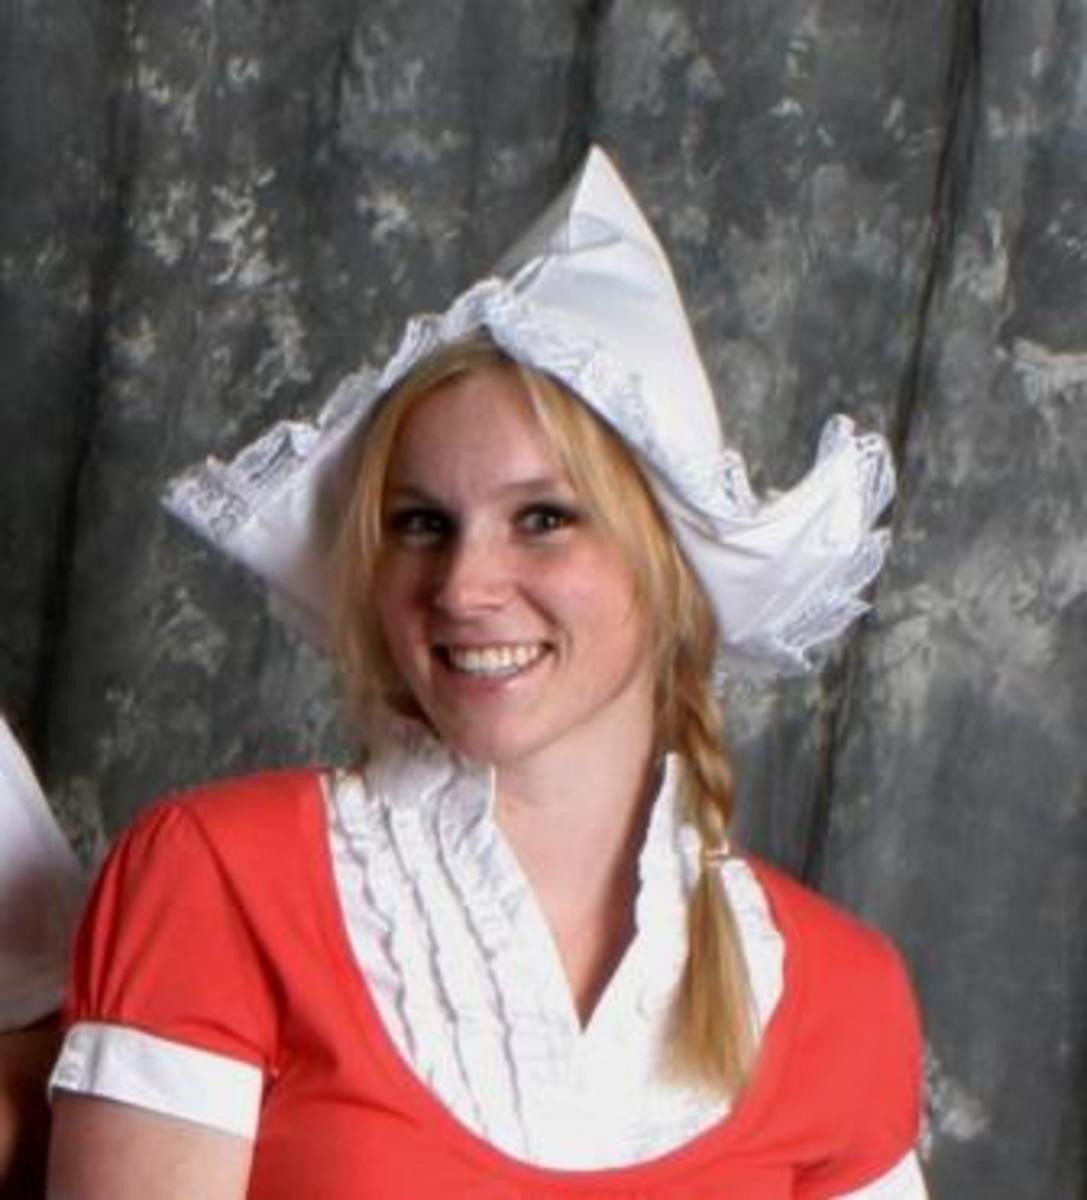 Dutch Cap - Great for wearing when walking along a Dyke?